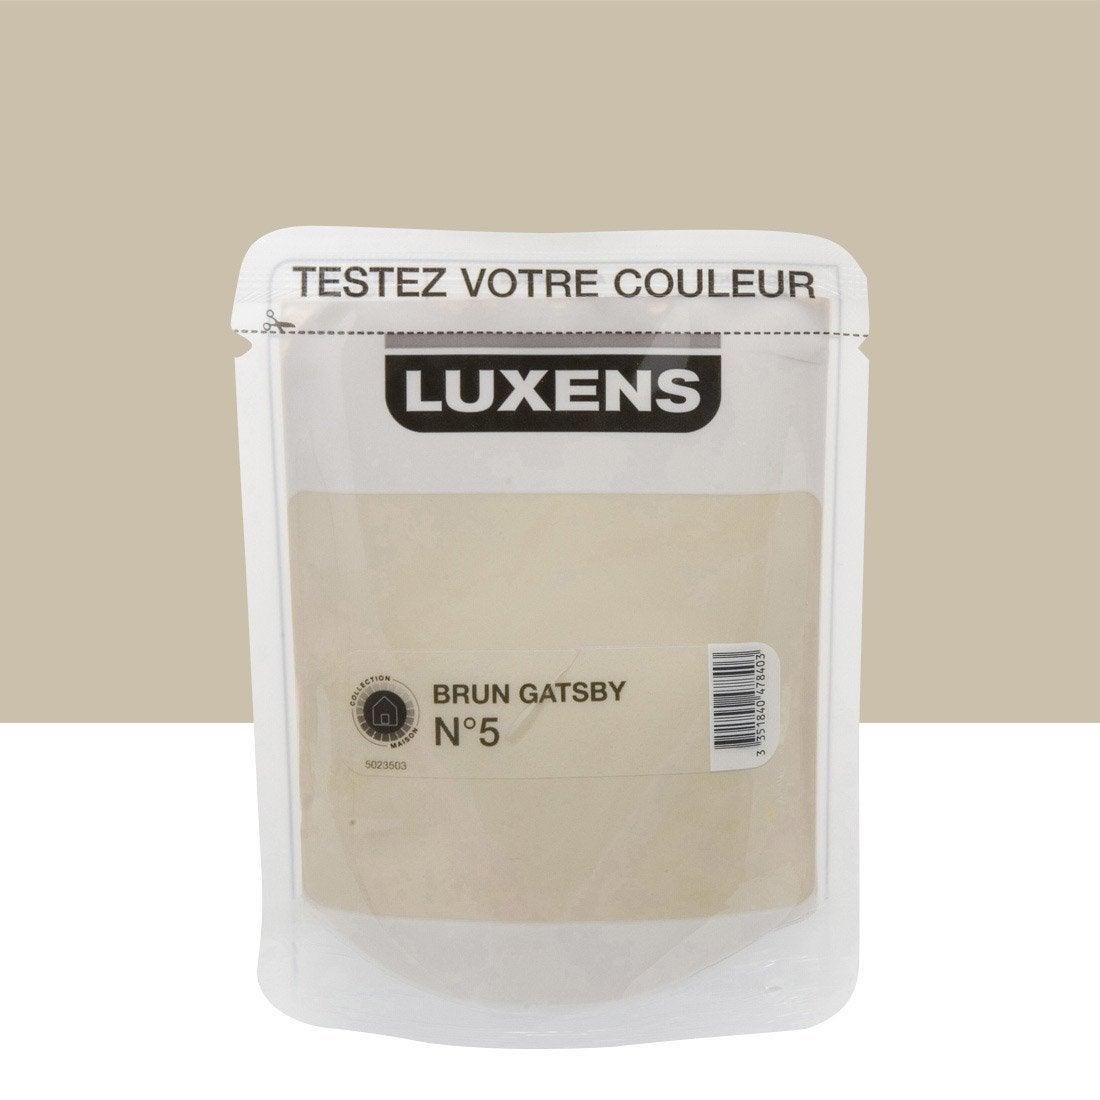 Testeur peinture brun gatsby 5 luxens couleurs int rieures - Peinture leroy merlin luxens ...